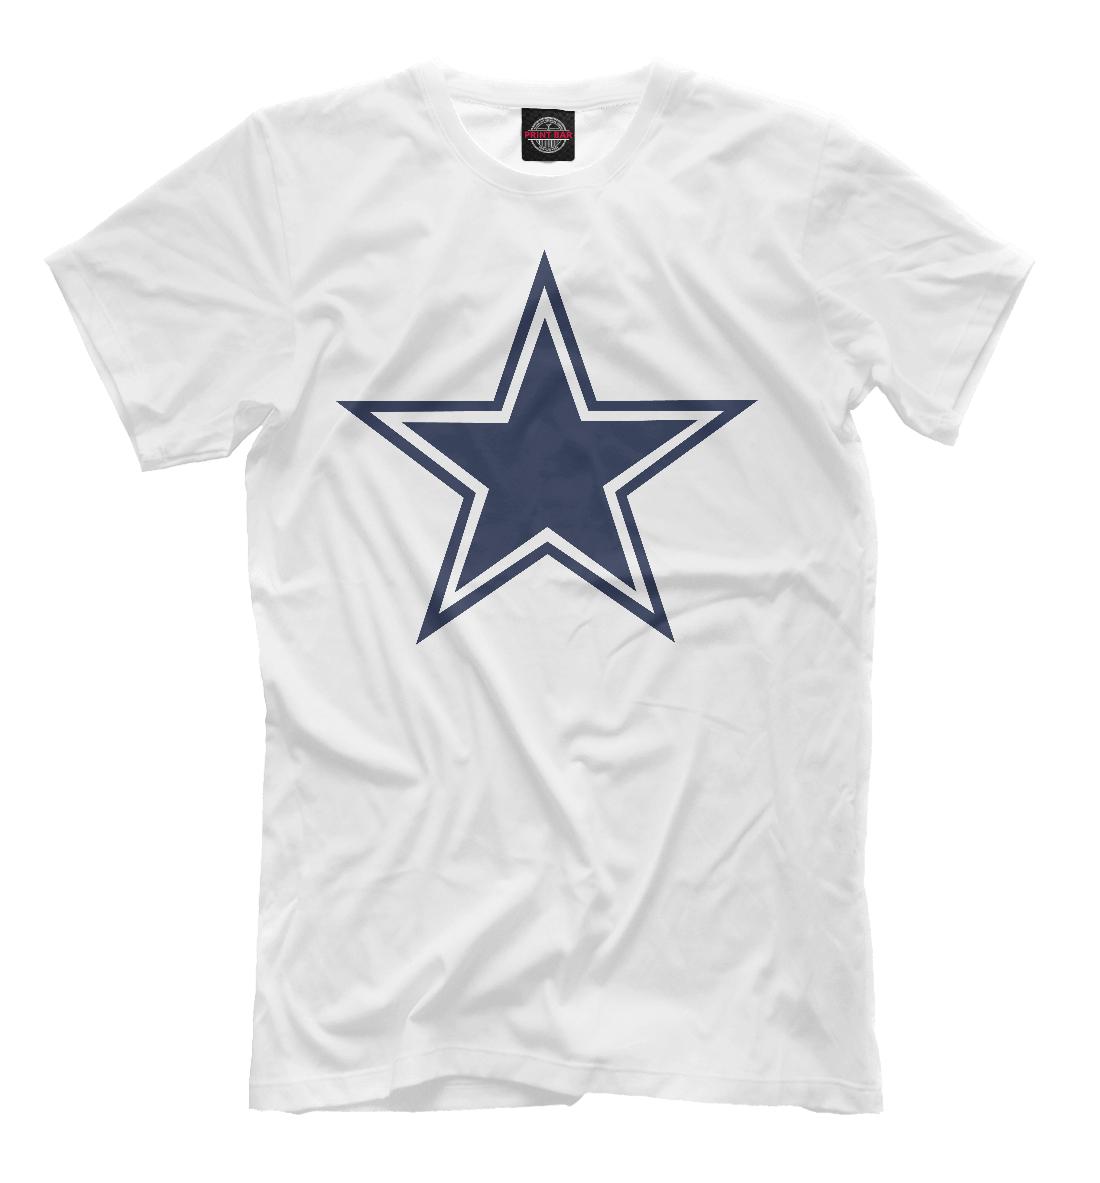 Купить Dallas Cowboys, Printbar, Футболки, APD-773920-fut-2